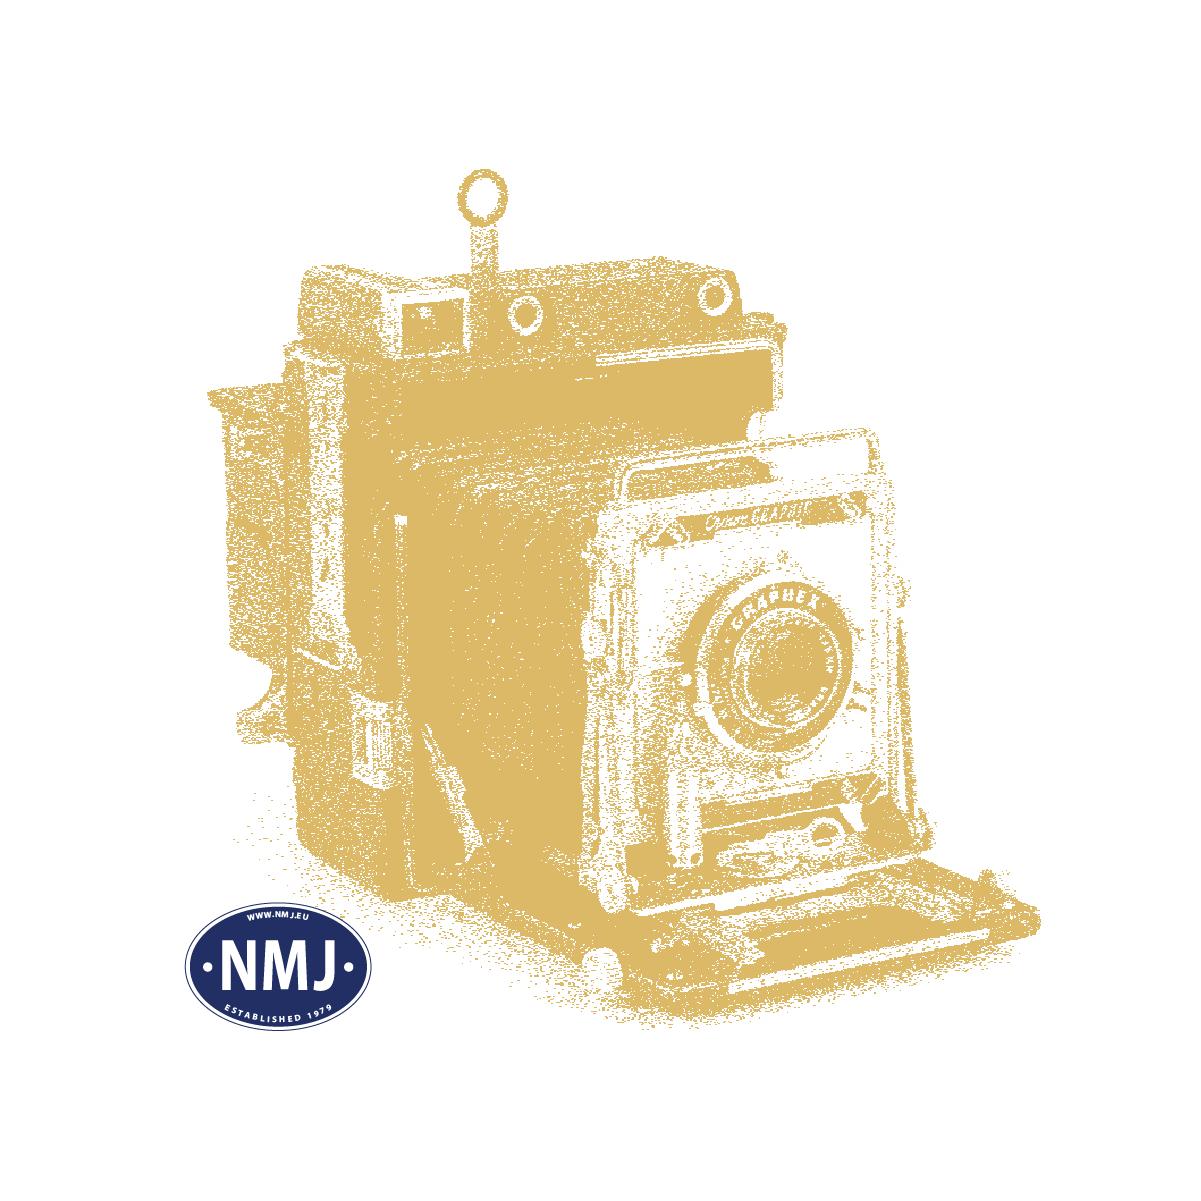 NMJT245001 - NMJ Topline NSB Di3b 641 Rotbraun design, 0-Skala, DCC Sound